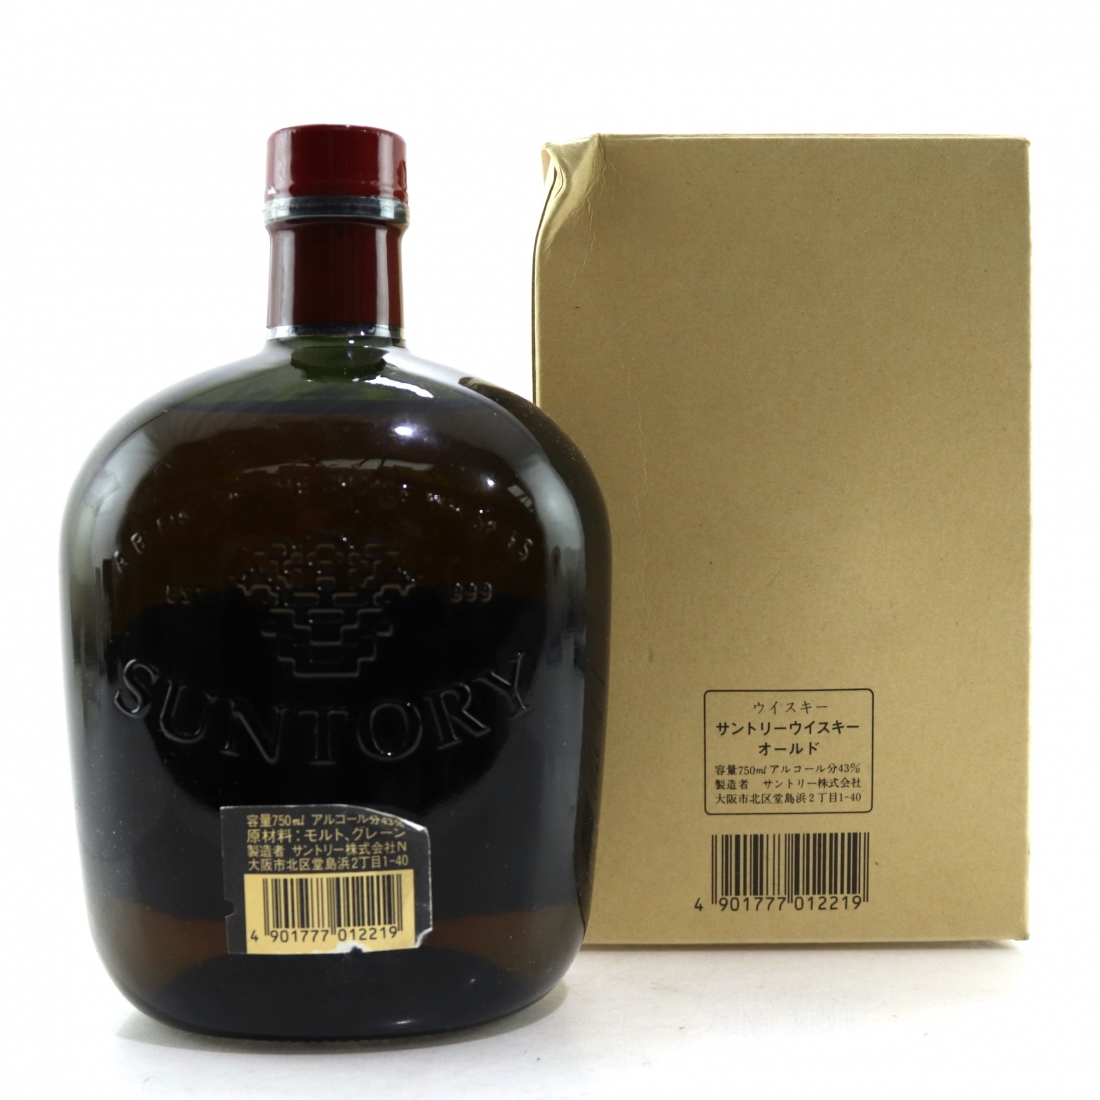 Suntory Old Whisky 75cl